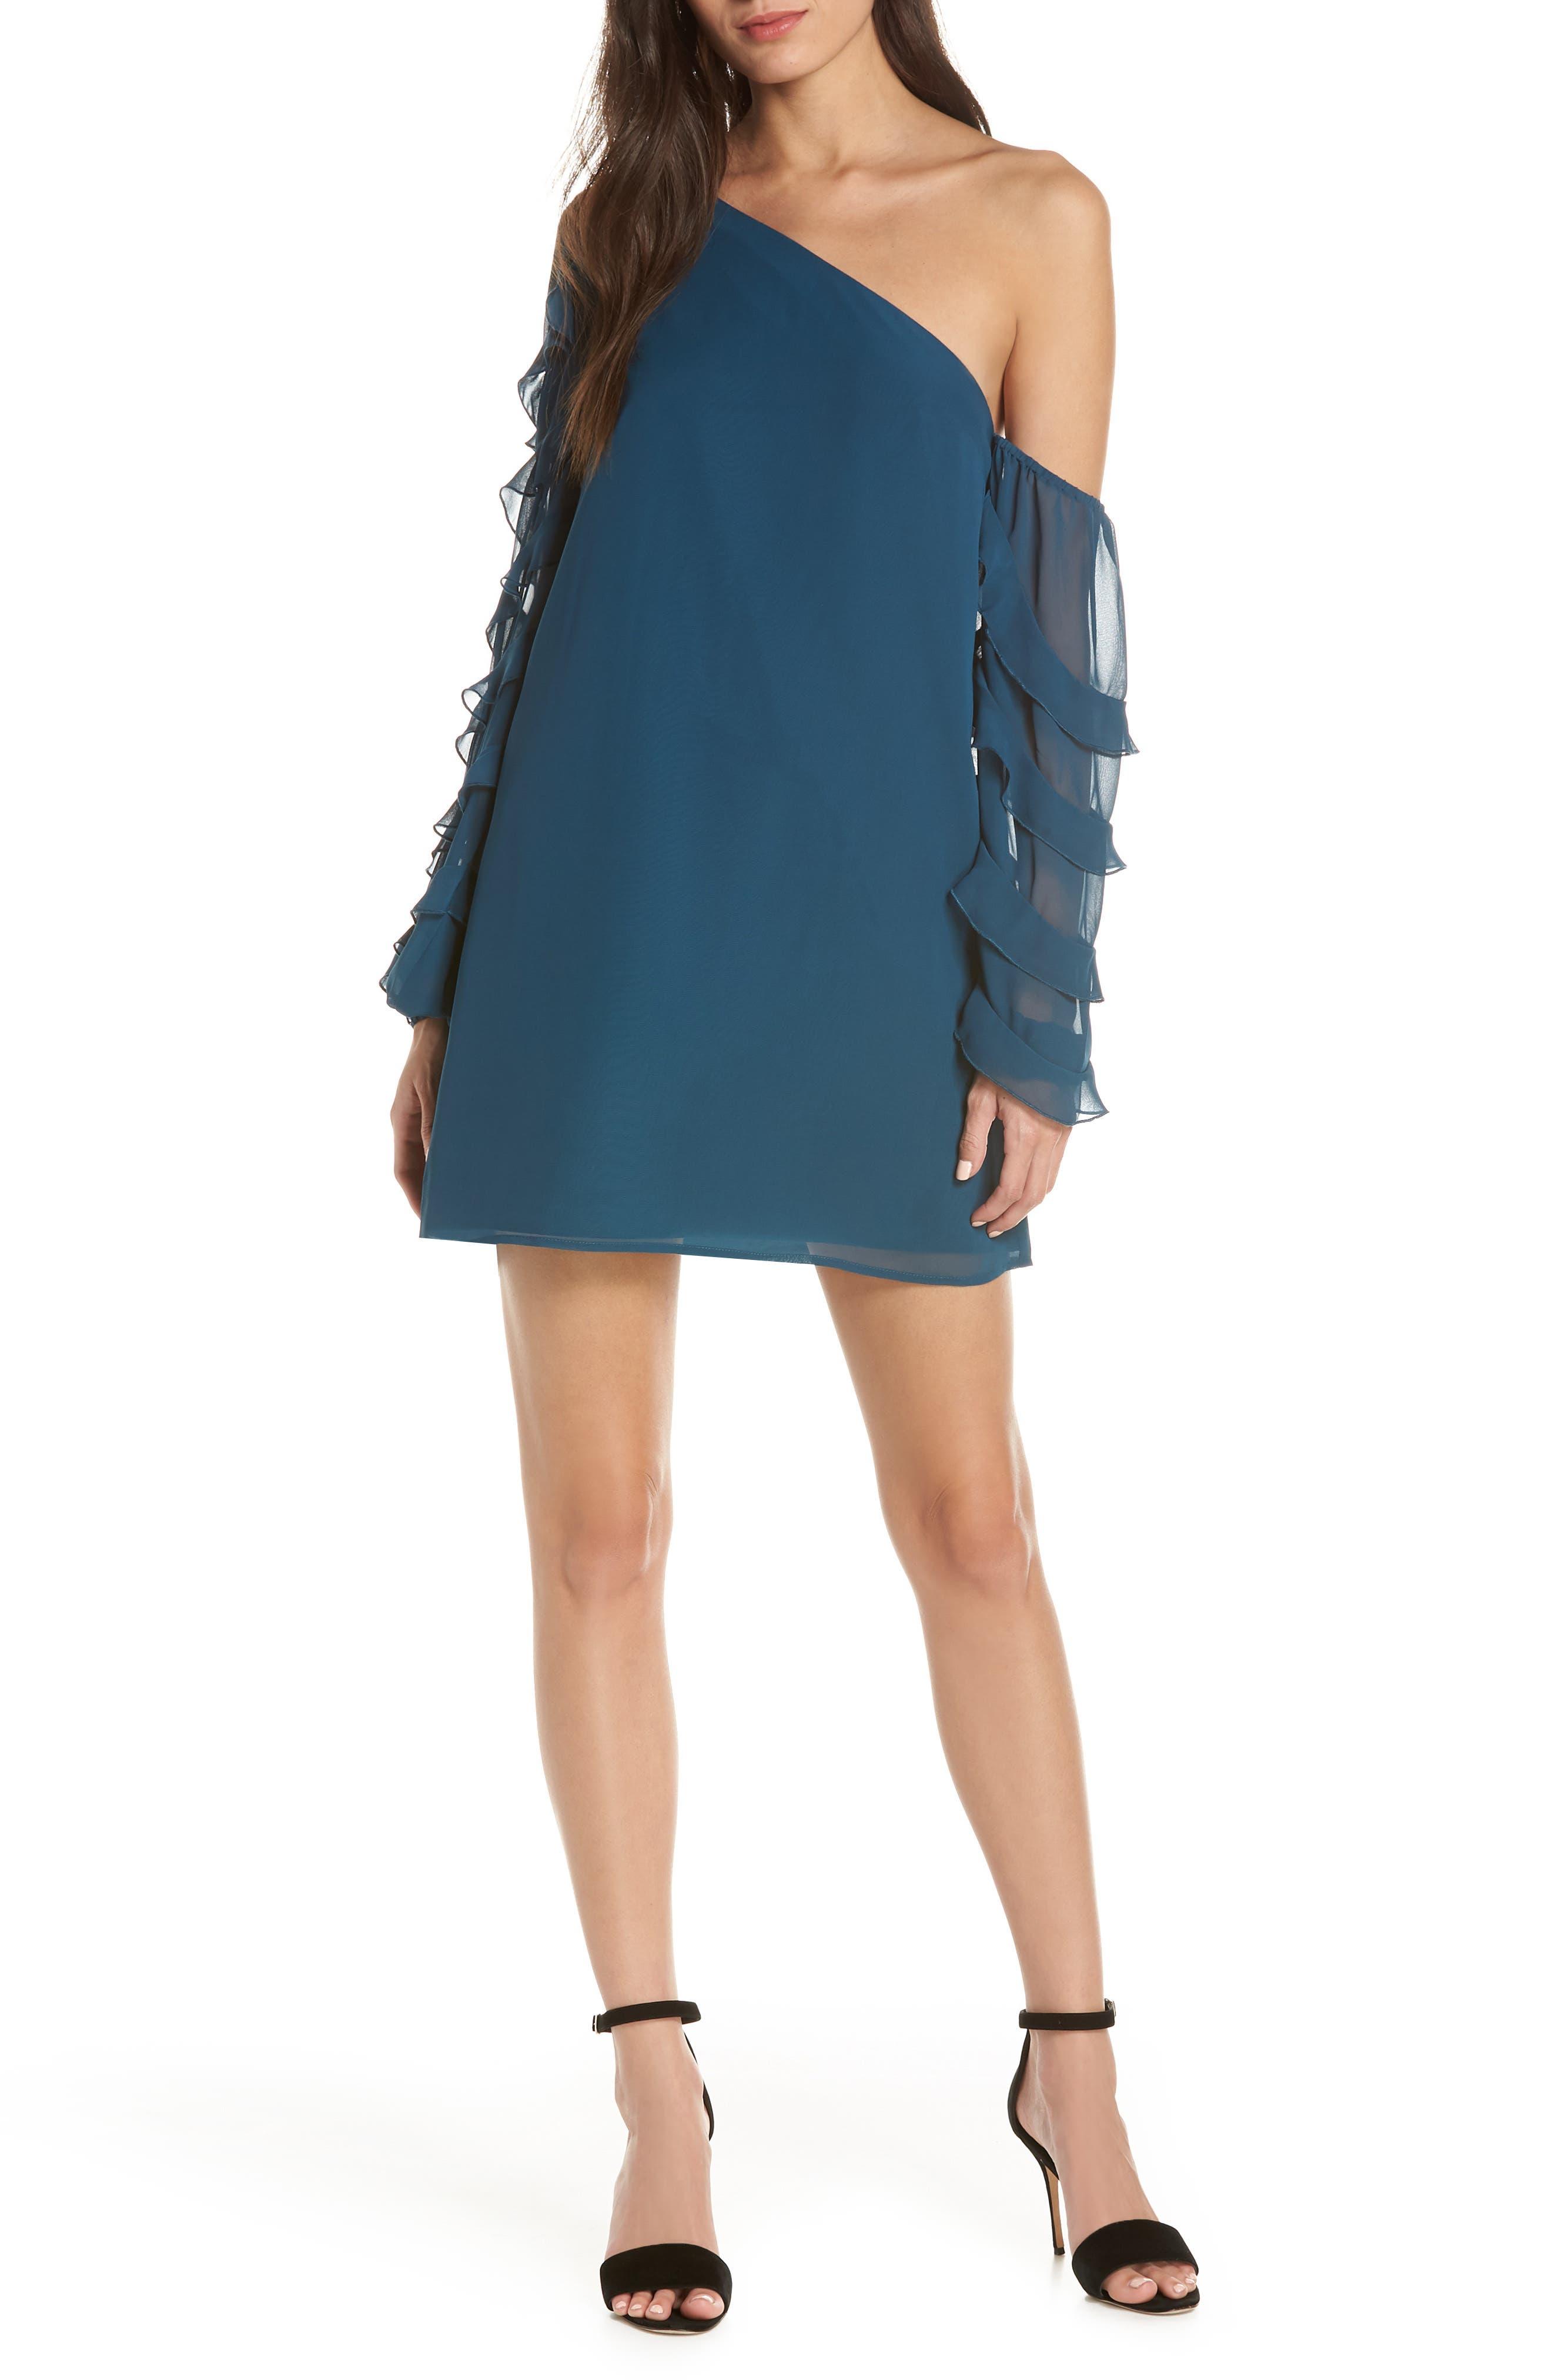 Ali & Jay Love The Way I Look Tonight One-Shoulder Minidress, Blue